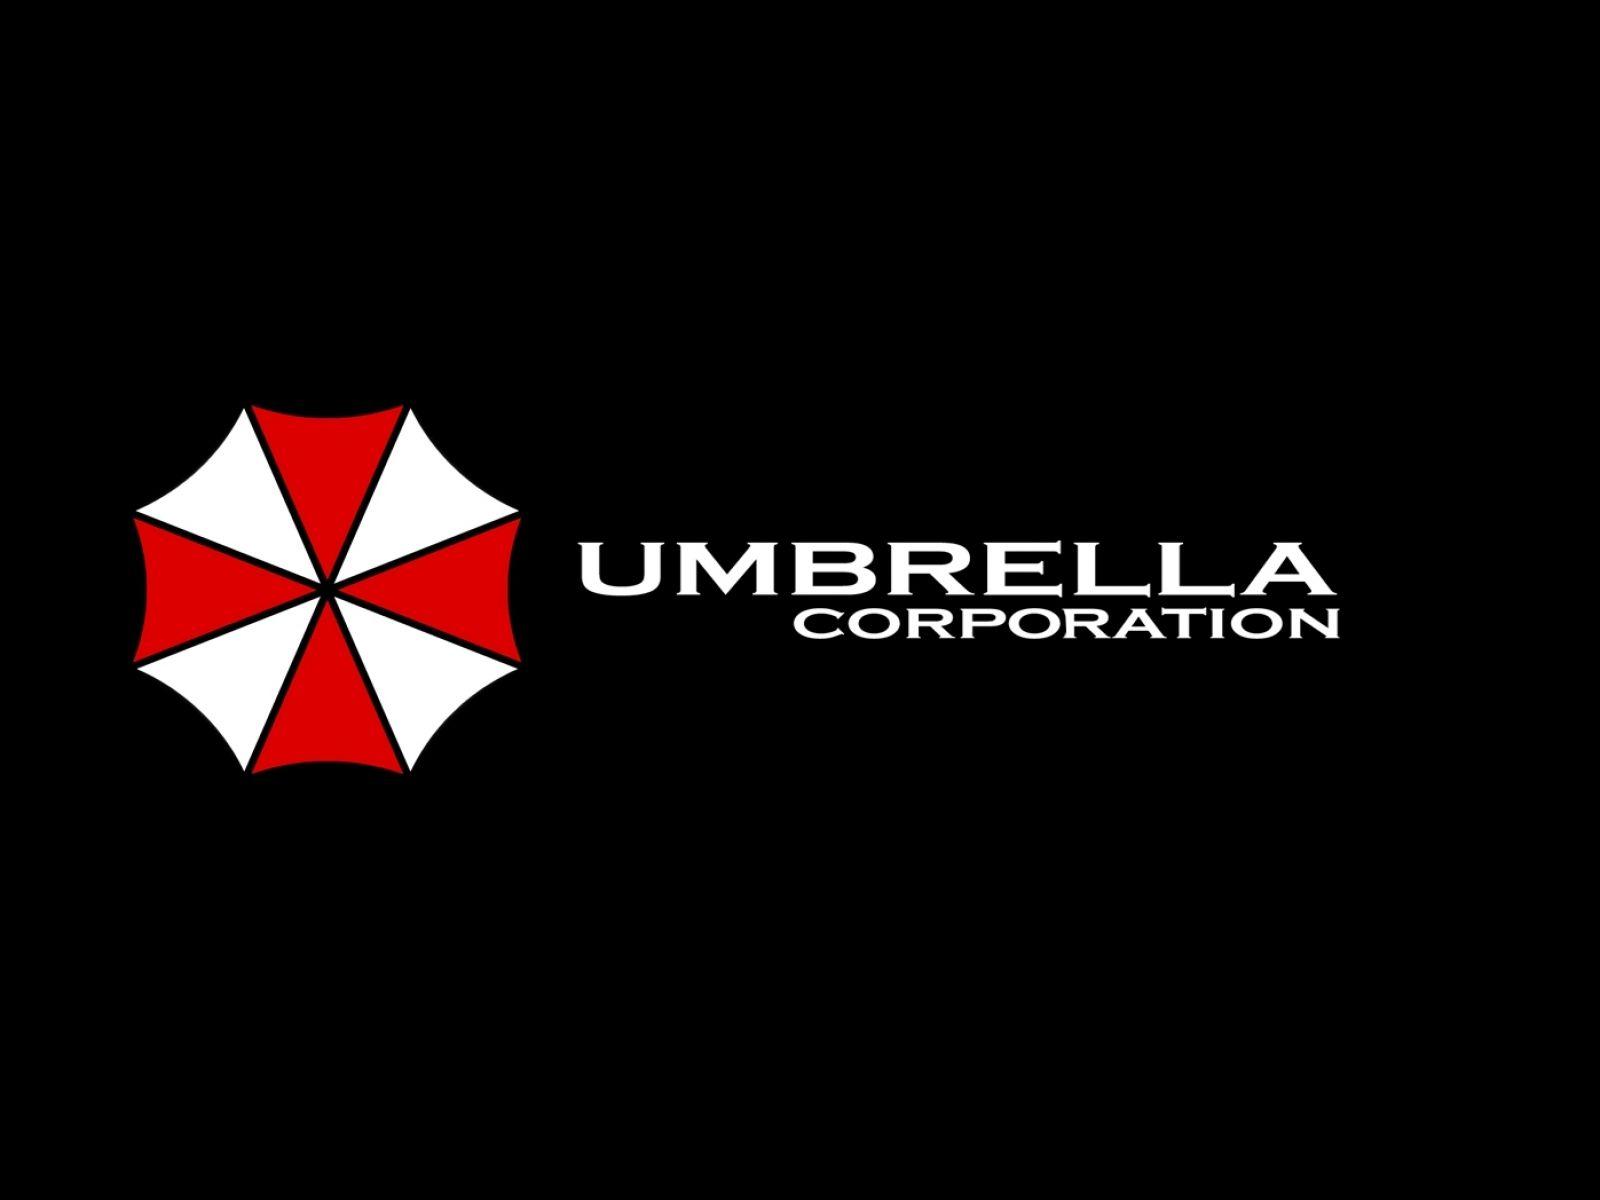 Umbrella Corporation Umbrella Corporation Company Logo Umbrella Company